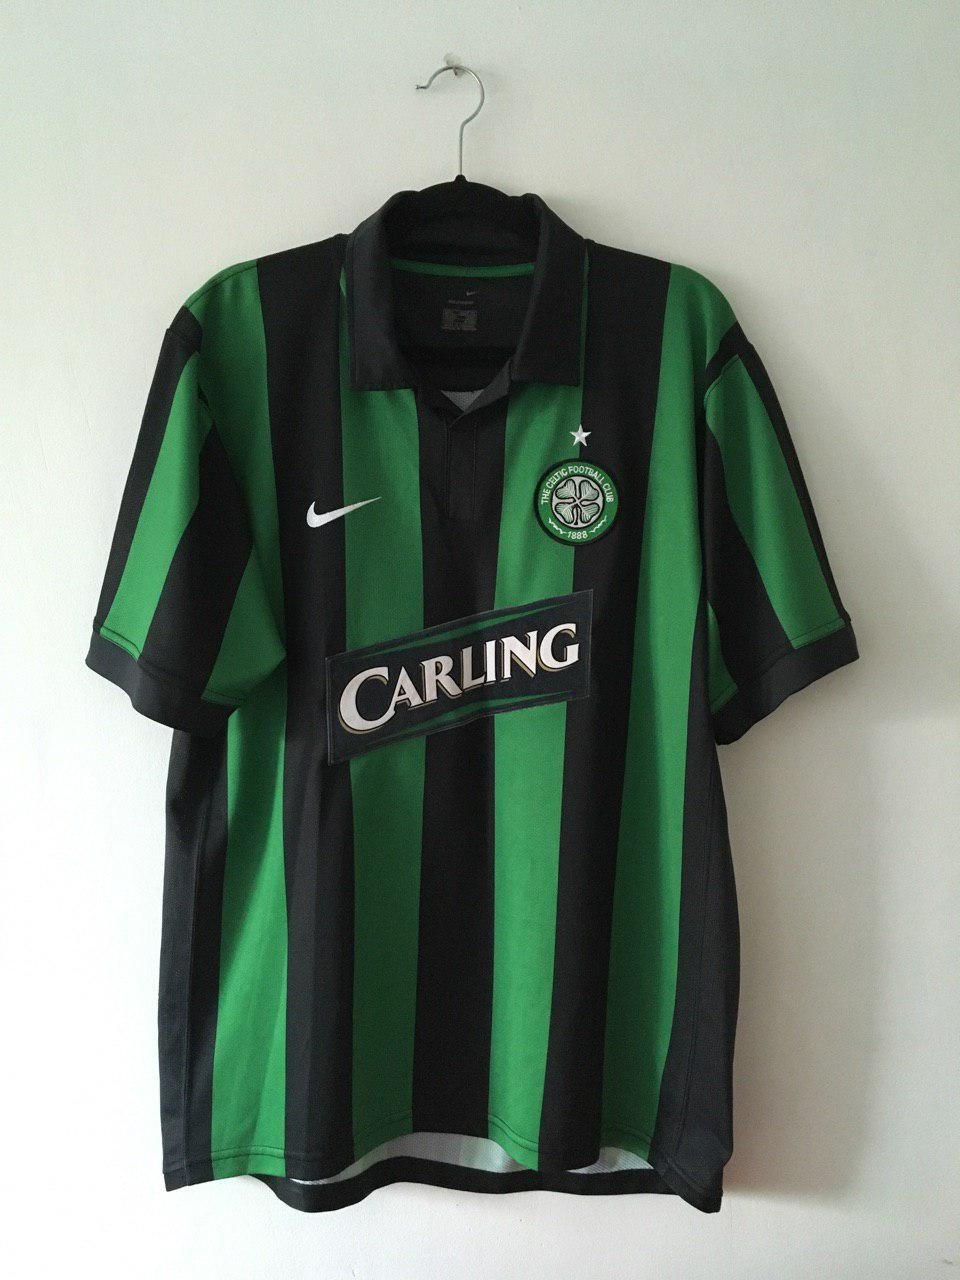 Celtic Away football shirt 2006 - 2007. Sponsored by Carling